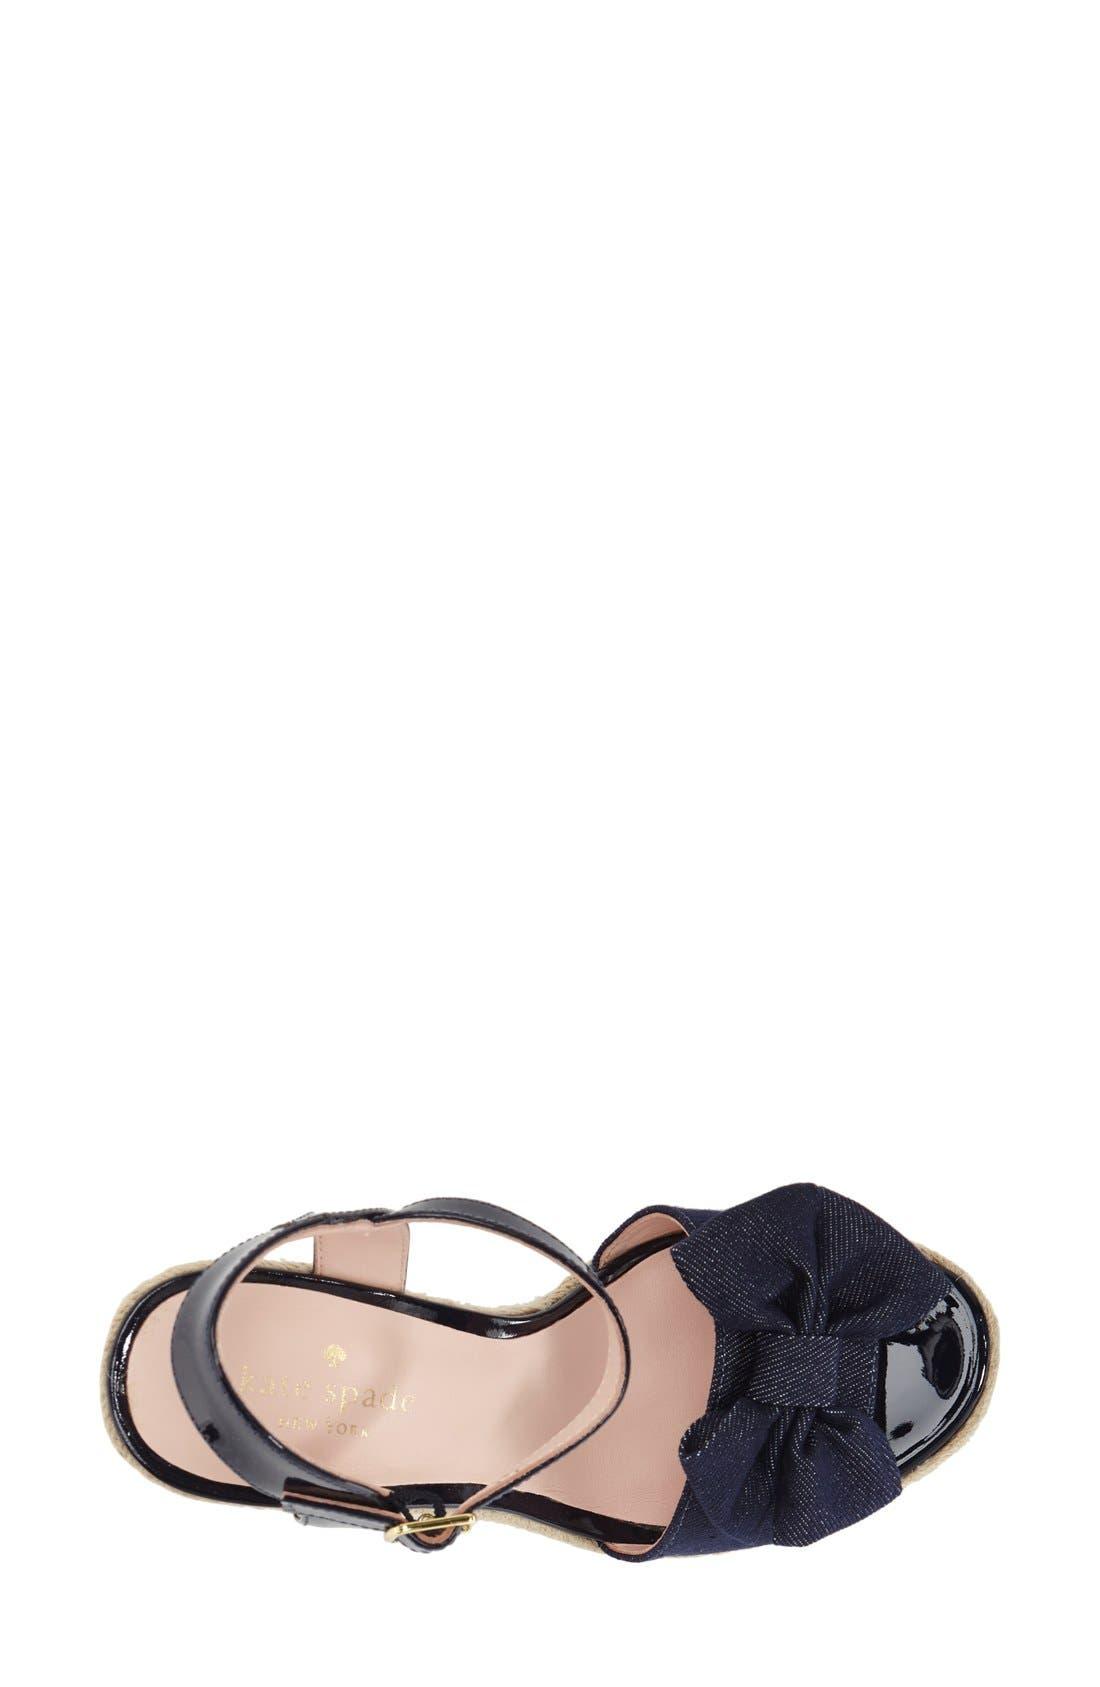 Alternate Image 3  - kate spade new york 'darya' wedge sandal (Women)